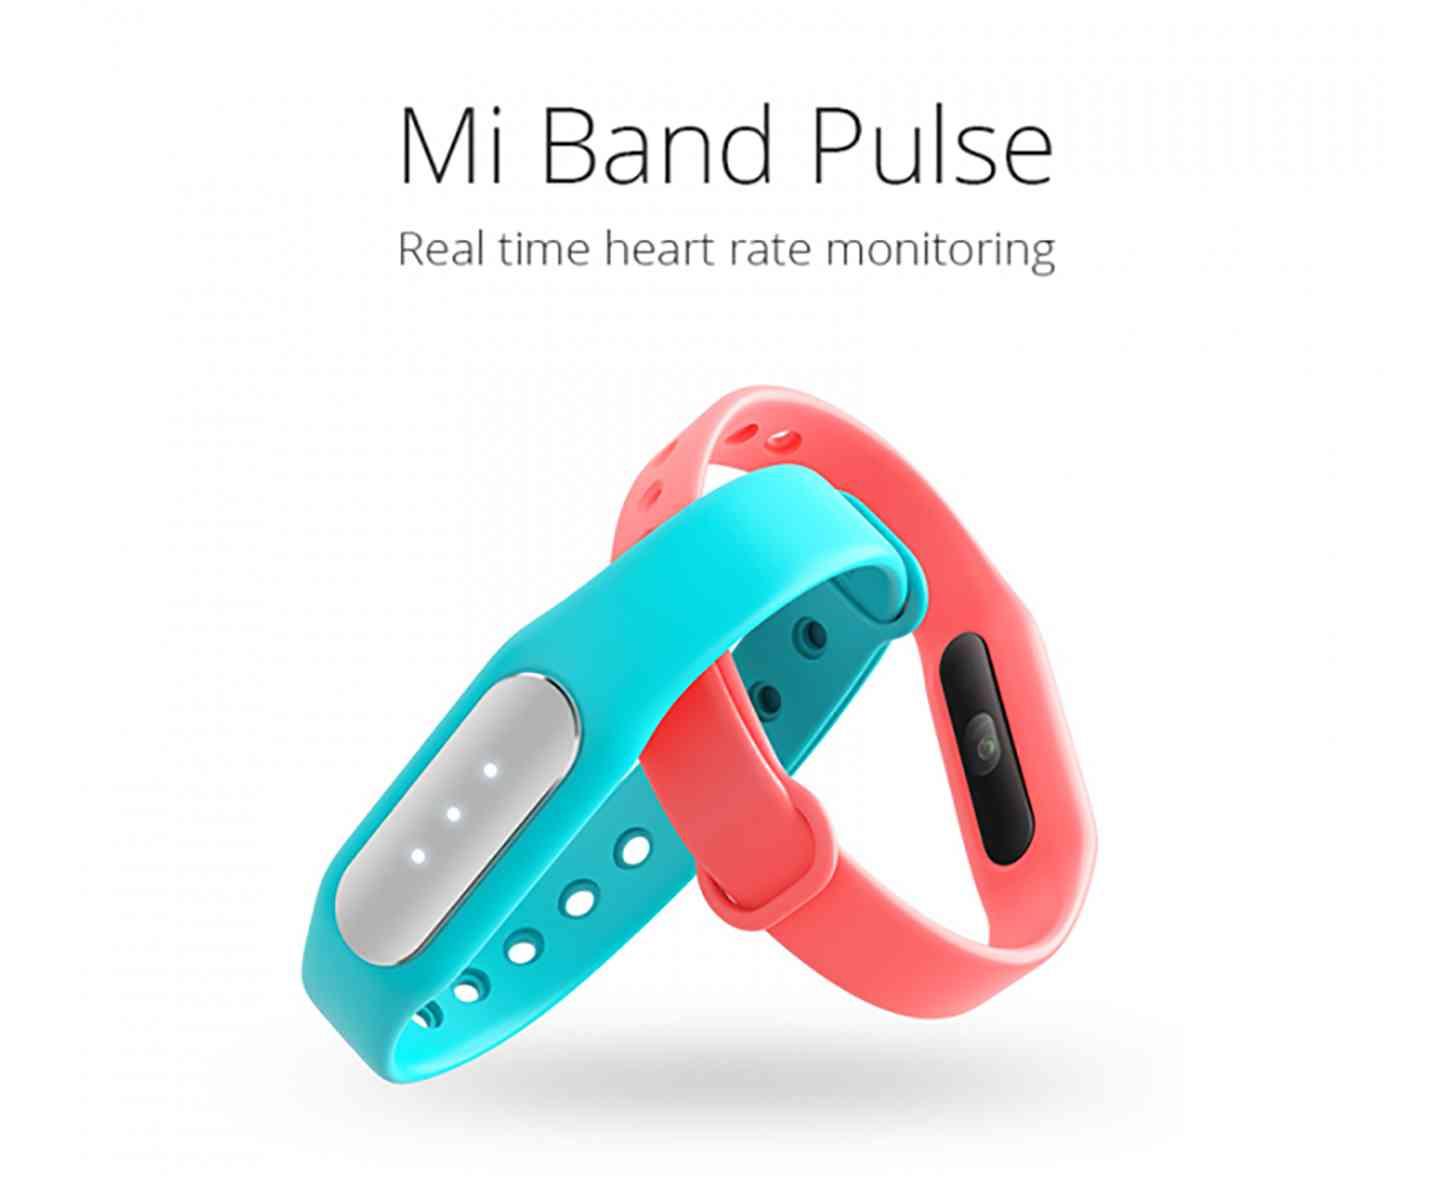 Xiaomi Mi Band Pulse large